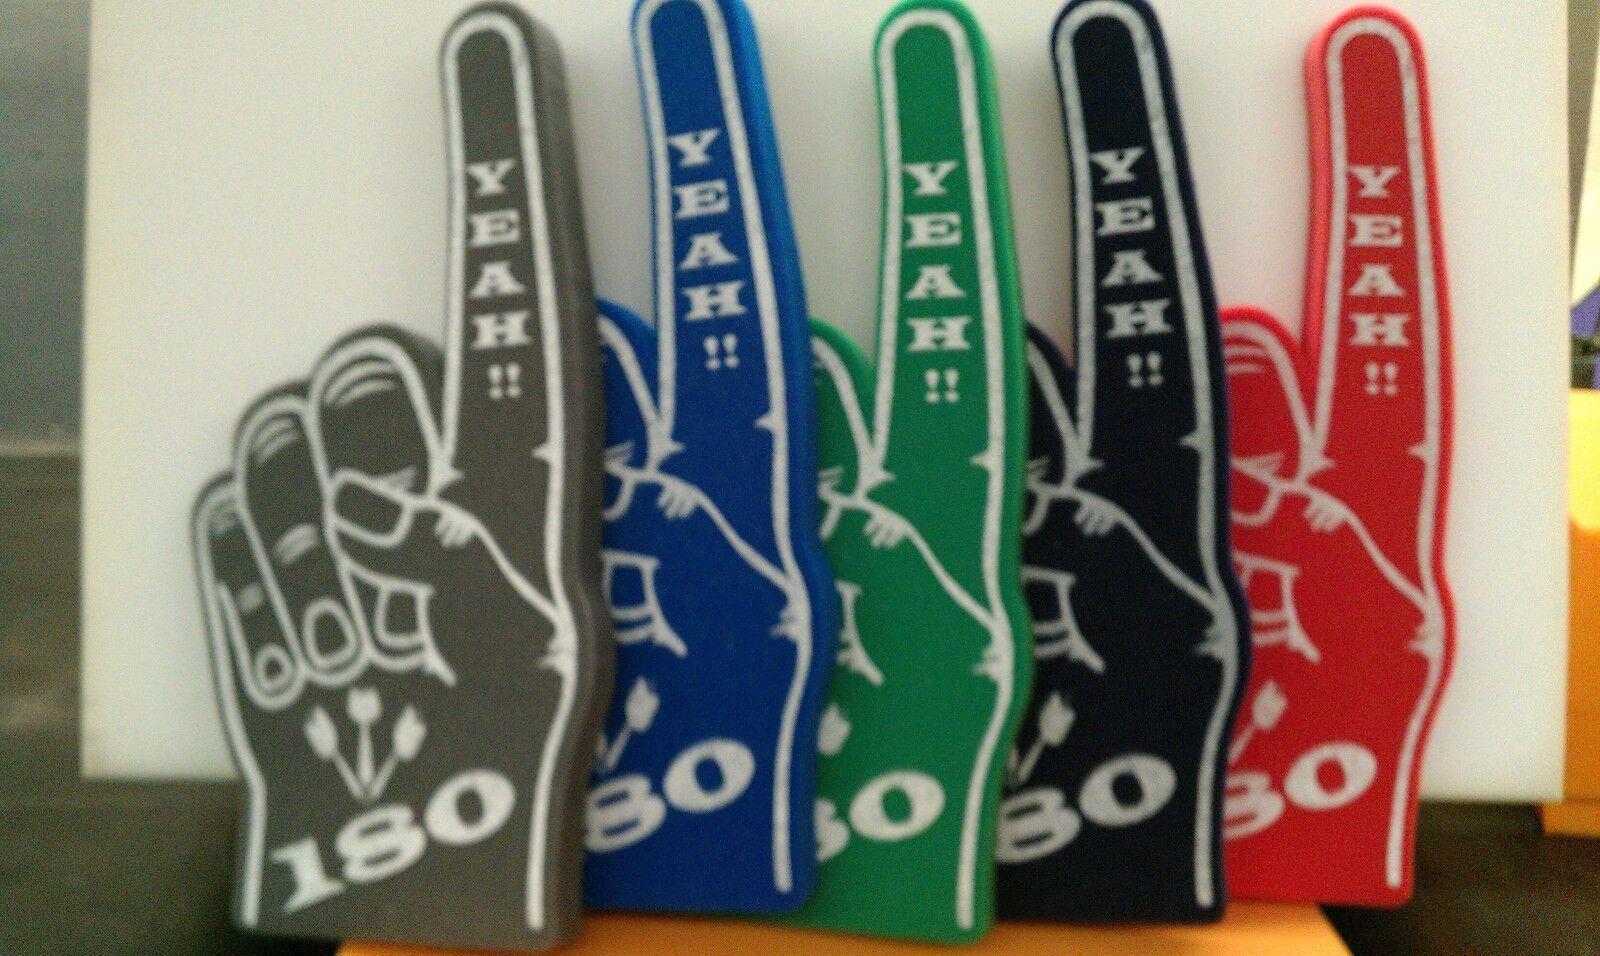 Darts Yeah 180  Giant Foam Hand Pointy Finger Packs  Of 10  últimos estilos